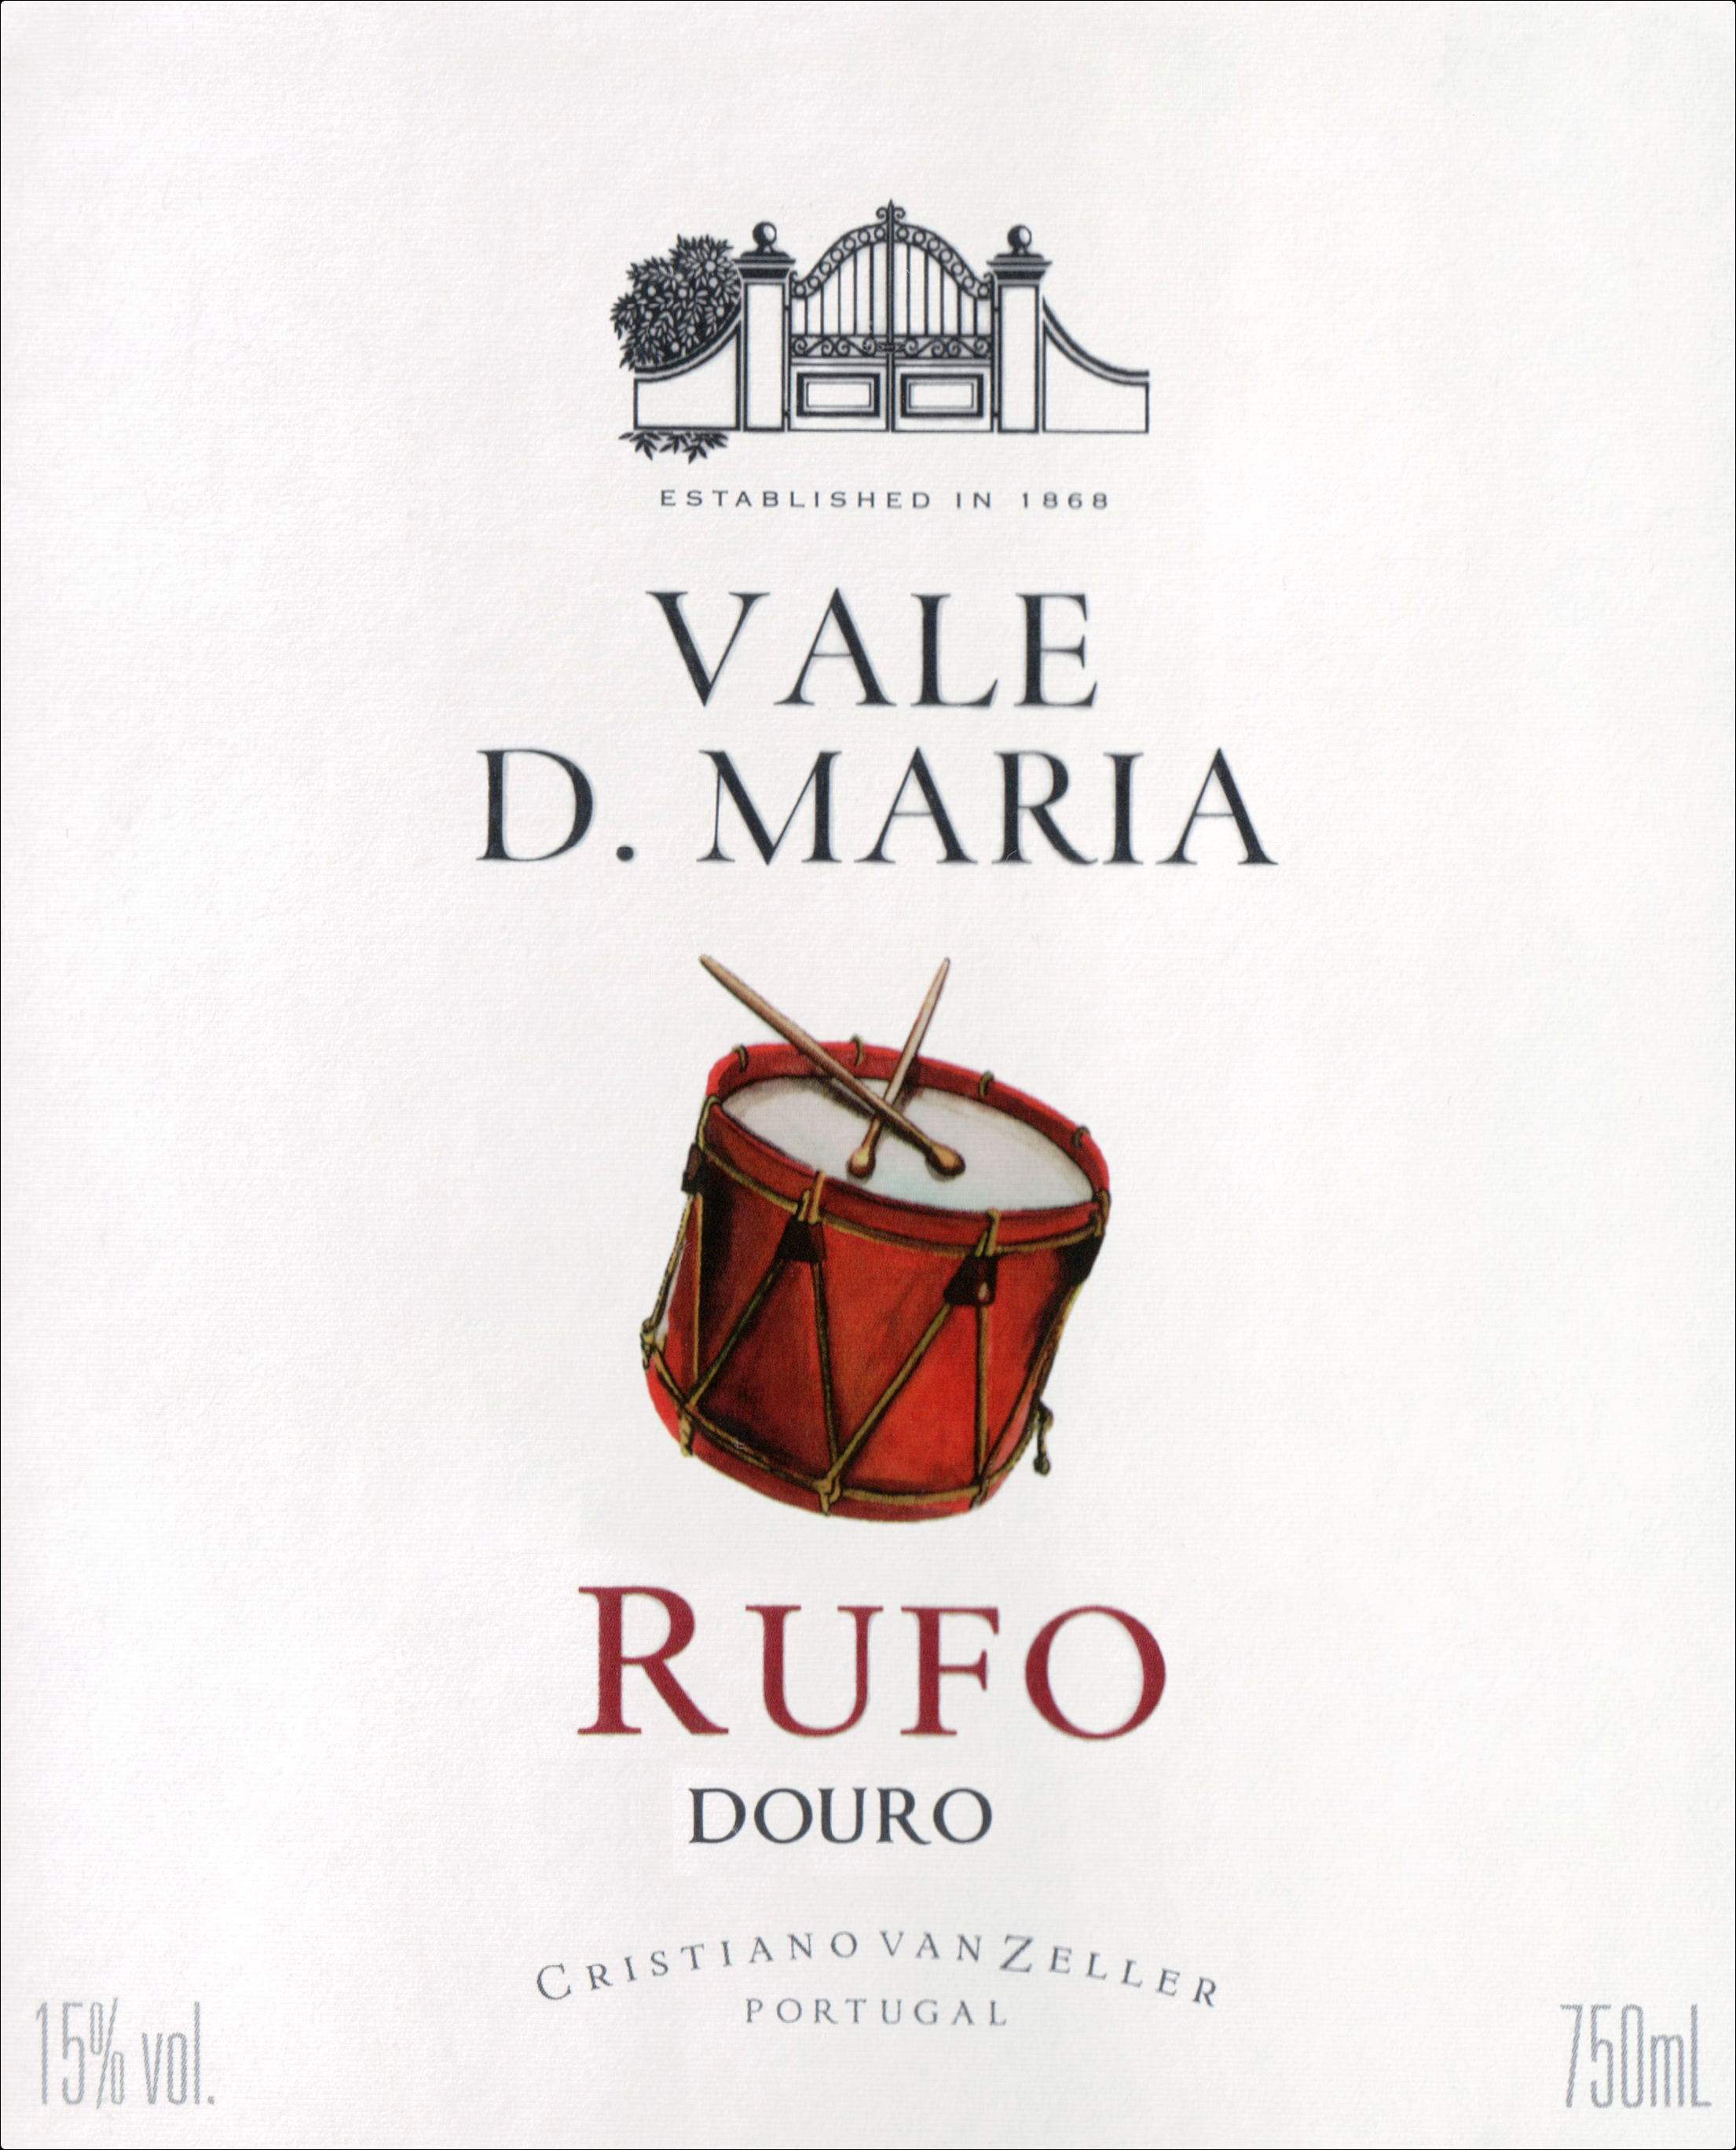 Quinta Vale Dona Maria Rufo Touriga Nacional & Touriga Franca 2016